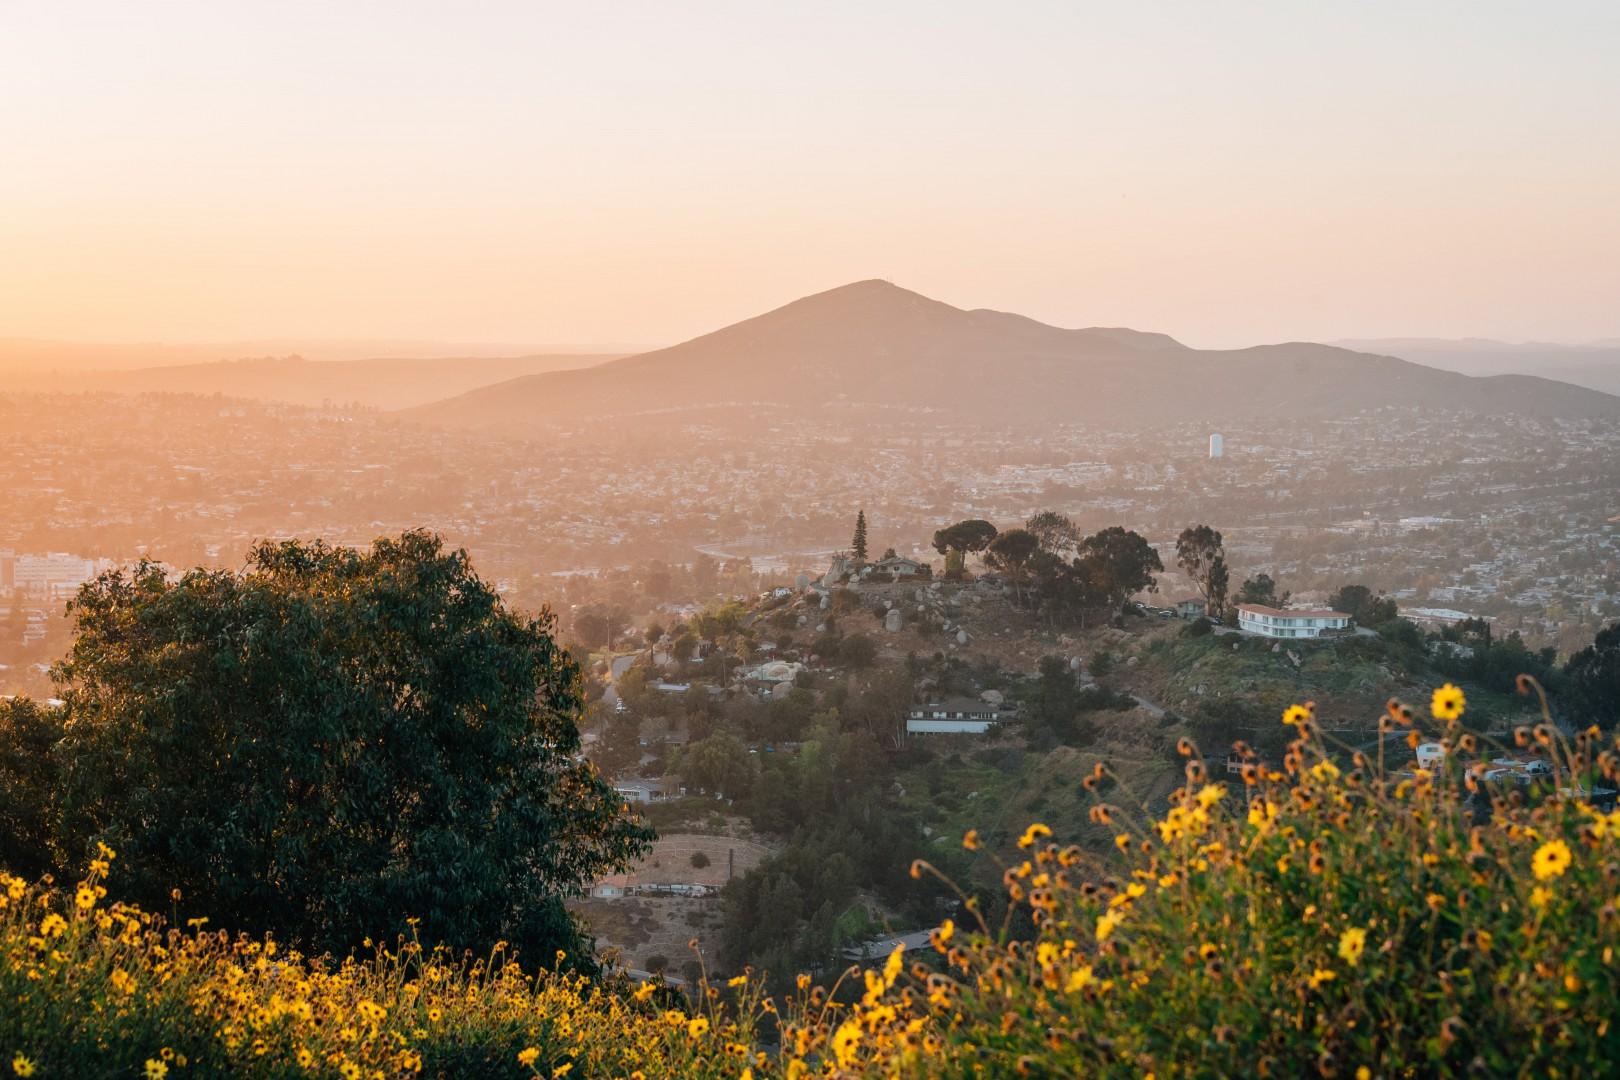 Mountain top view in Mira Mesa County California